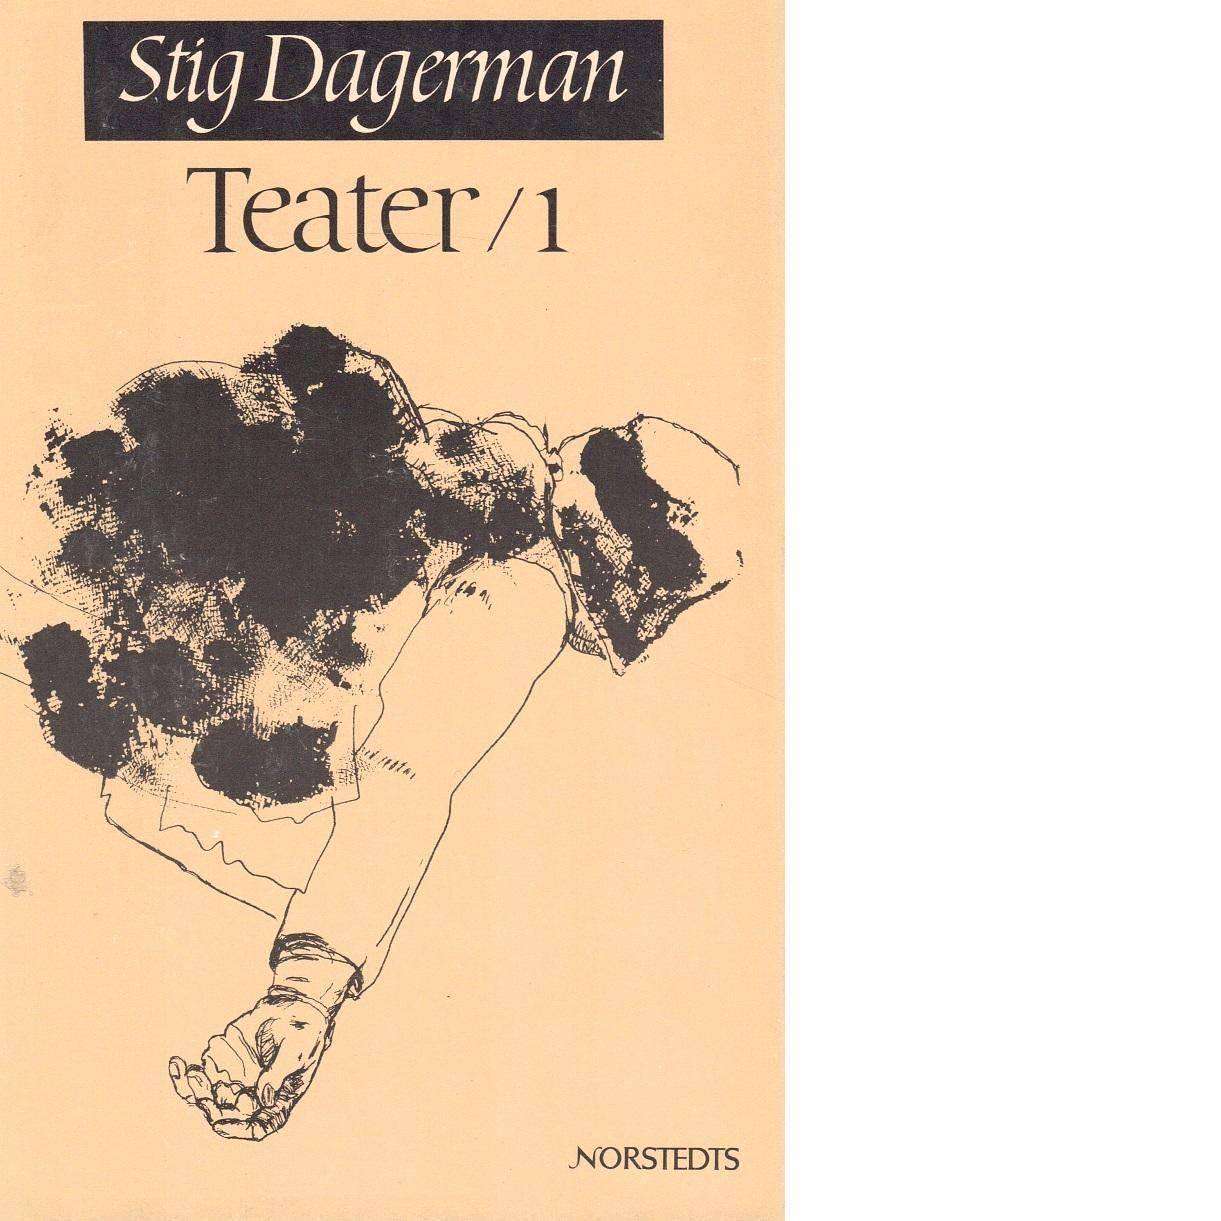 Samlade skrifter 6 Teater 1 - Dagerman, Stig